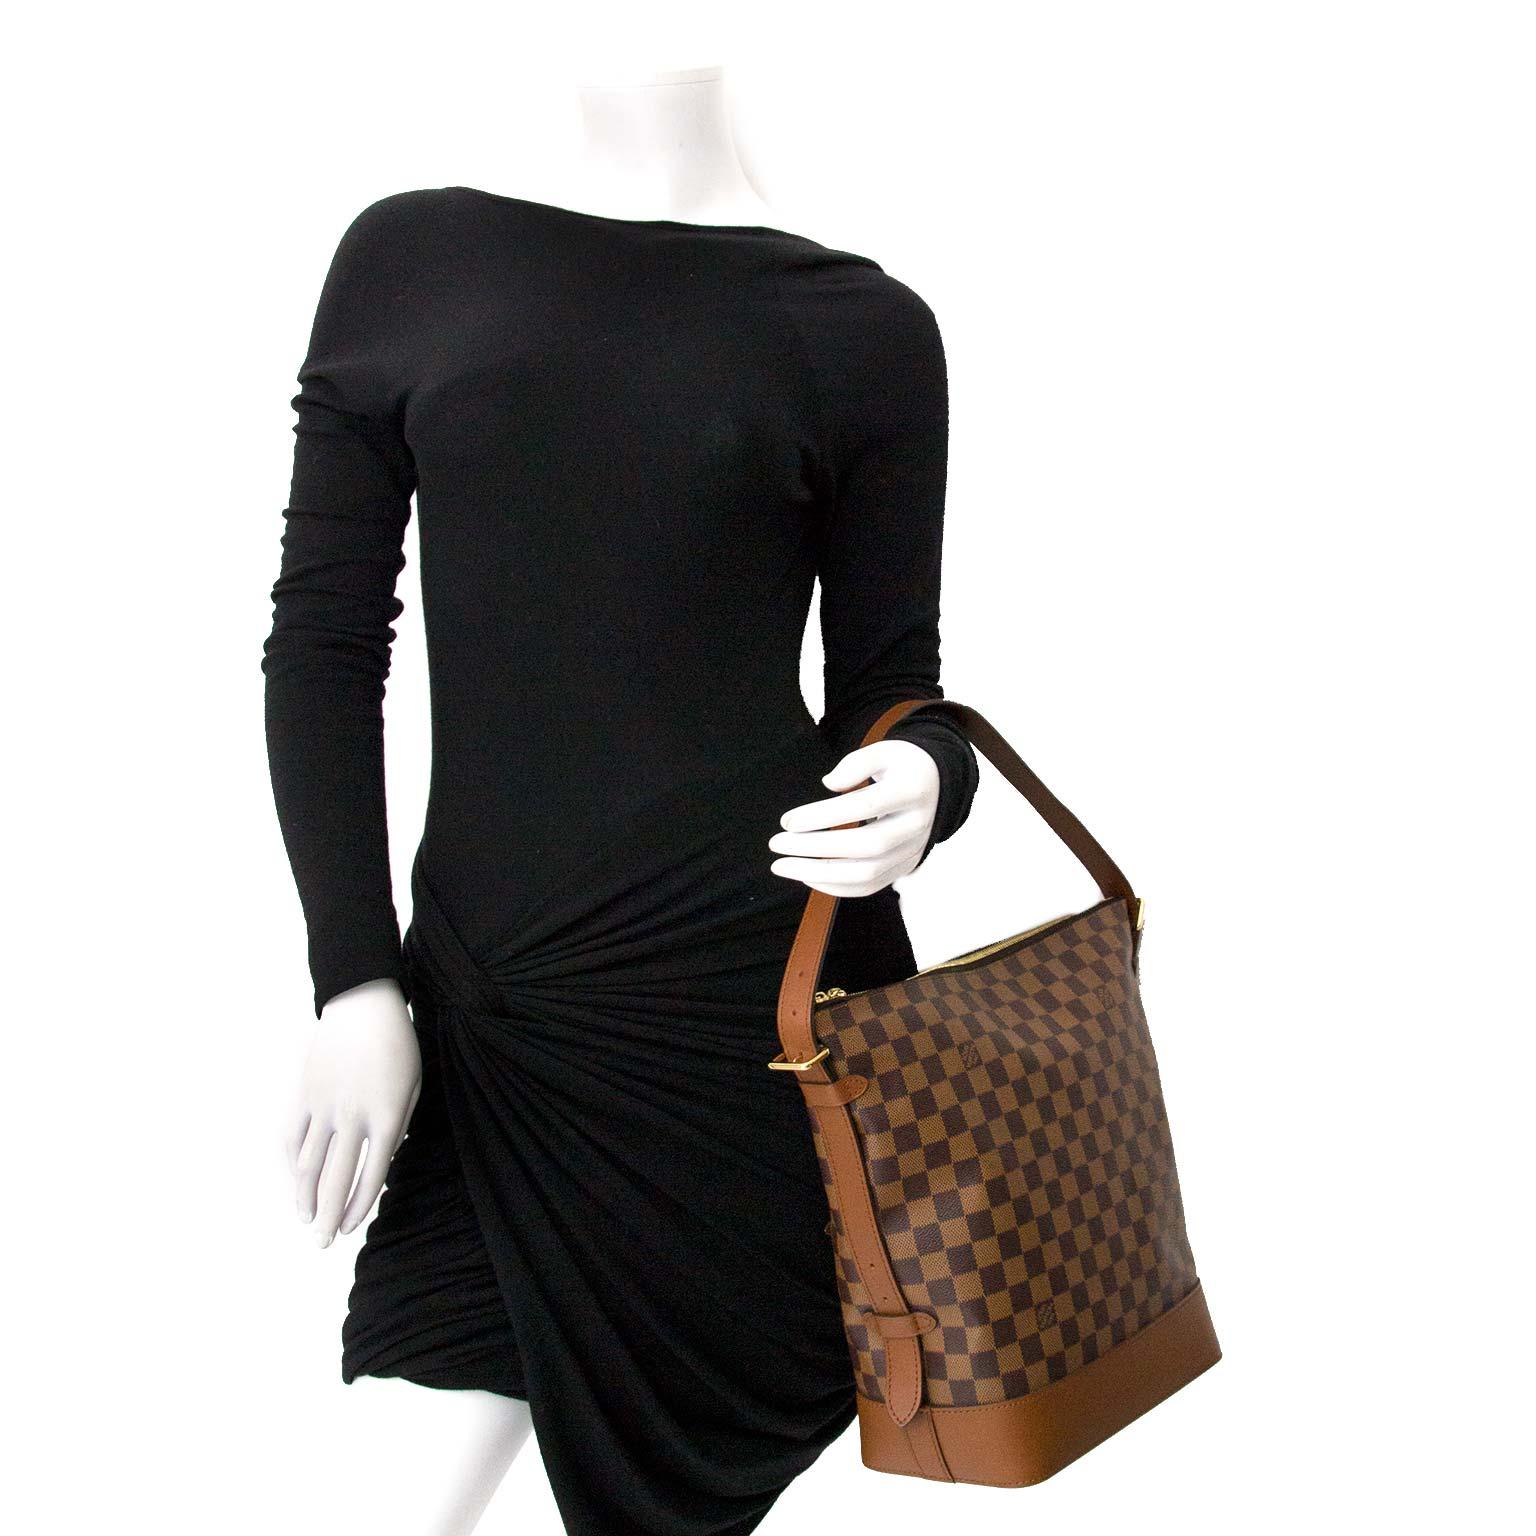 Louis Vuitton Damier Hobo Zipper Bag